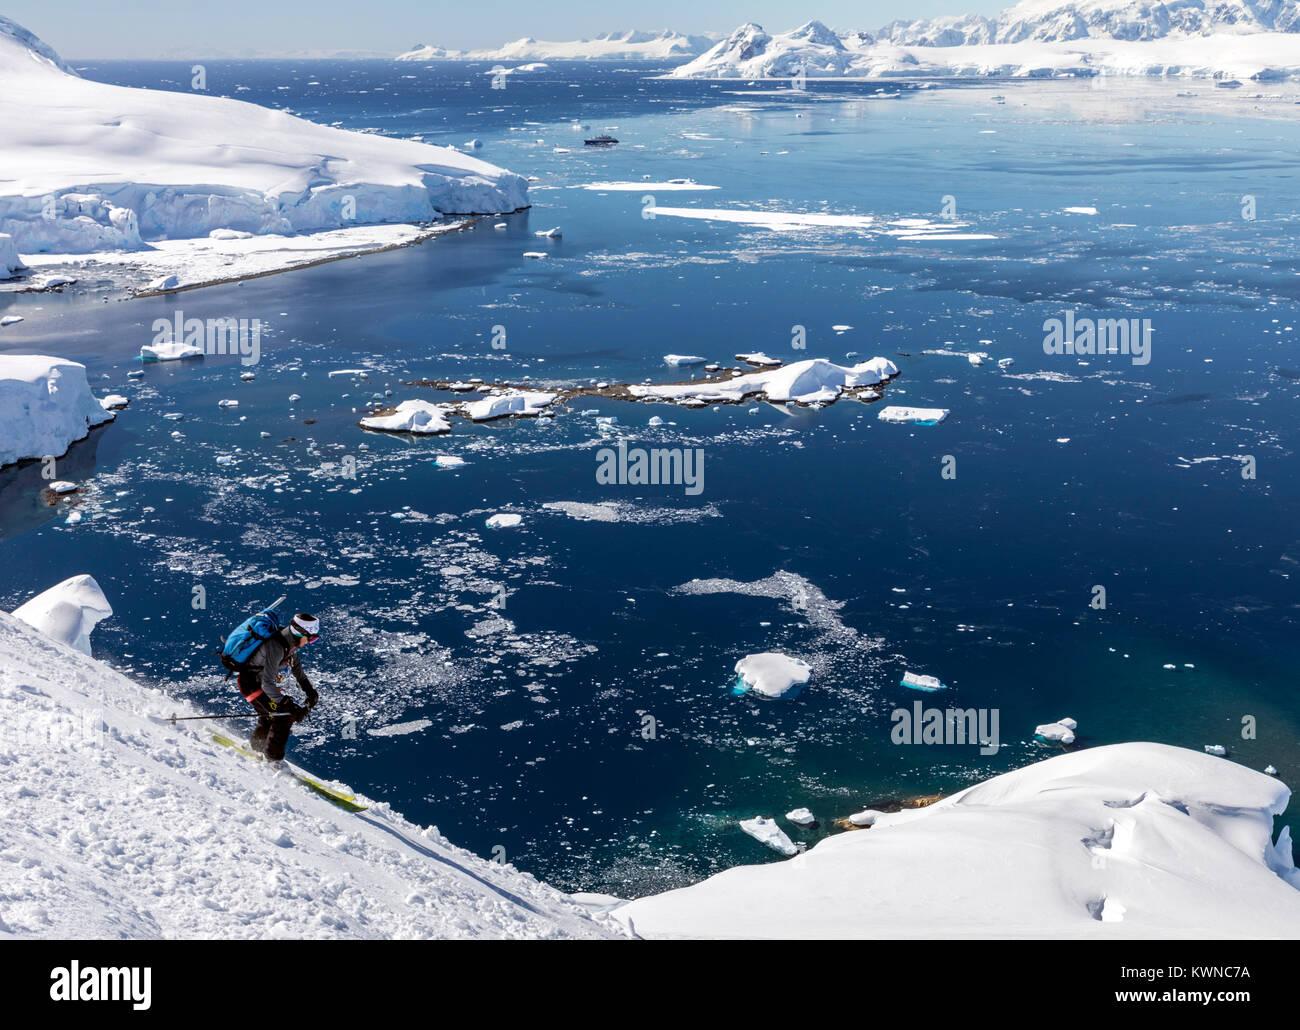 Alpine ski mountaineer skiing downhill in Antarctica; Nansen Island - Stock Image